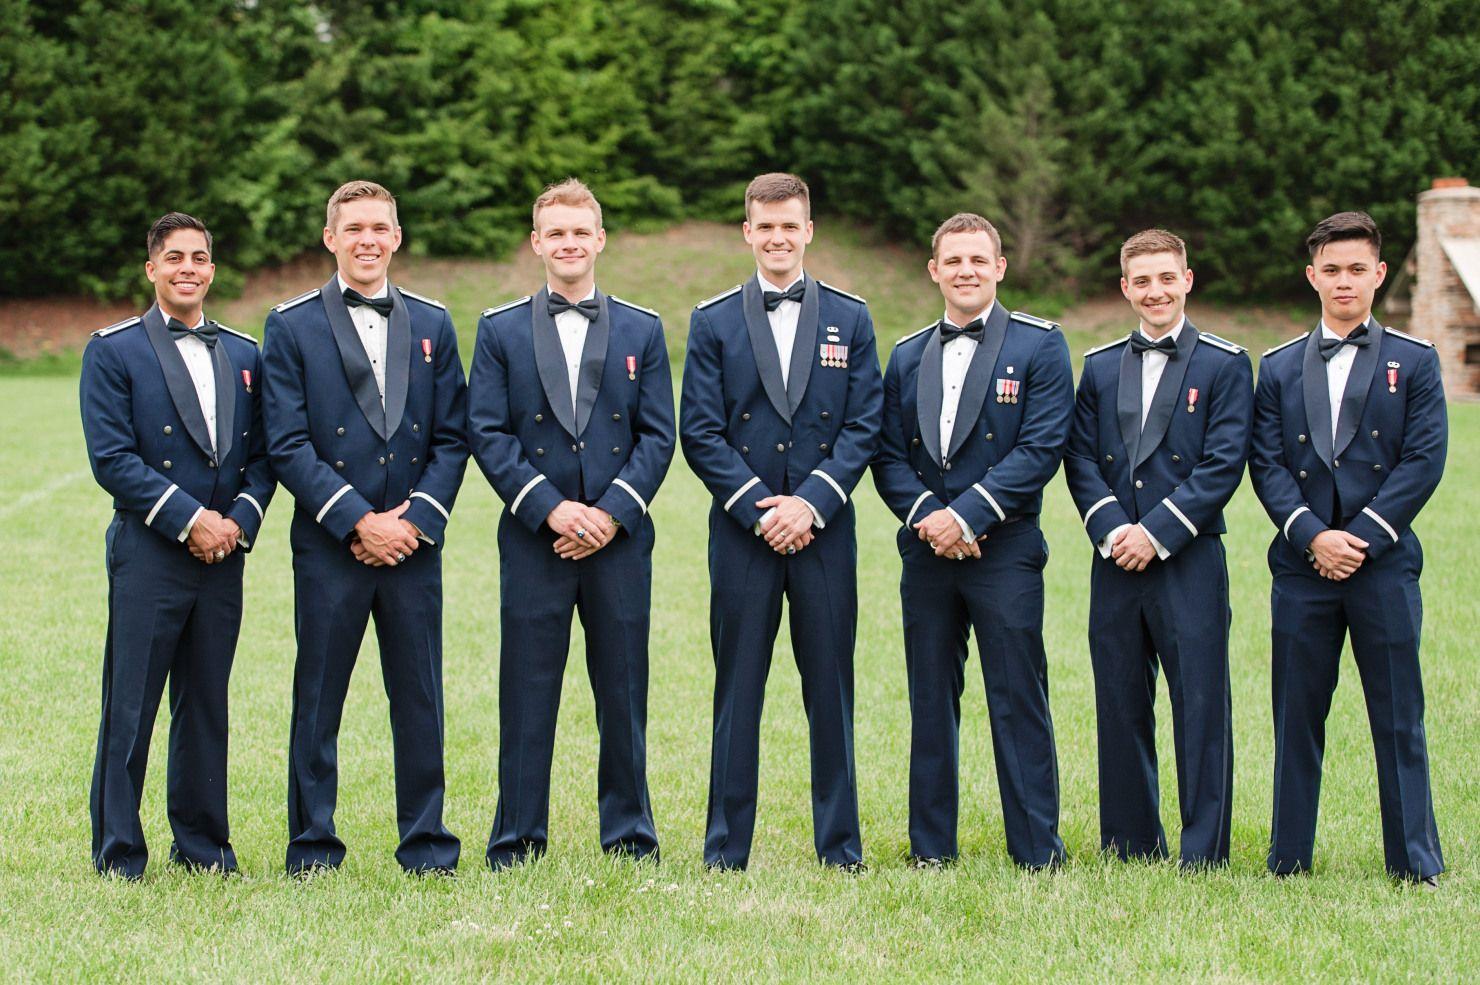 Air Force Groomsmen Pose For Military Wedding In Dress Uniform Air Force Wedding Wedding Party Shirts Military Wedding [ 985 x 1480 Pixel ]